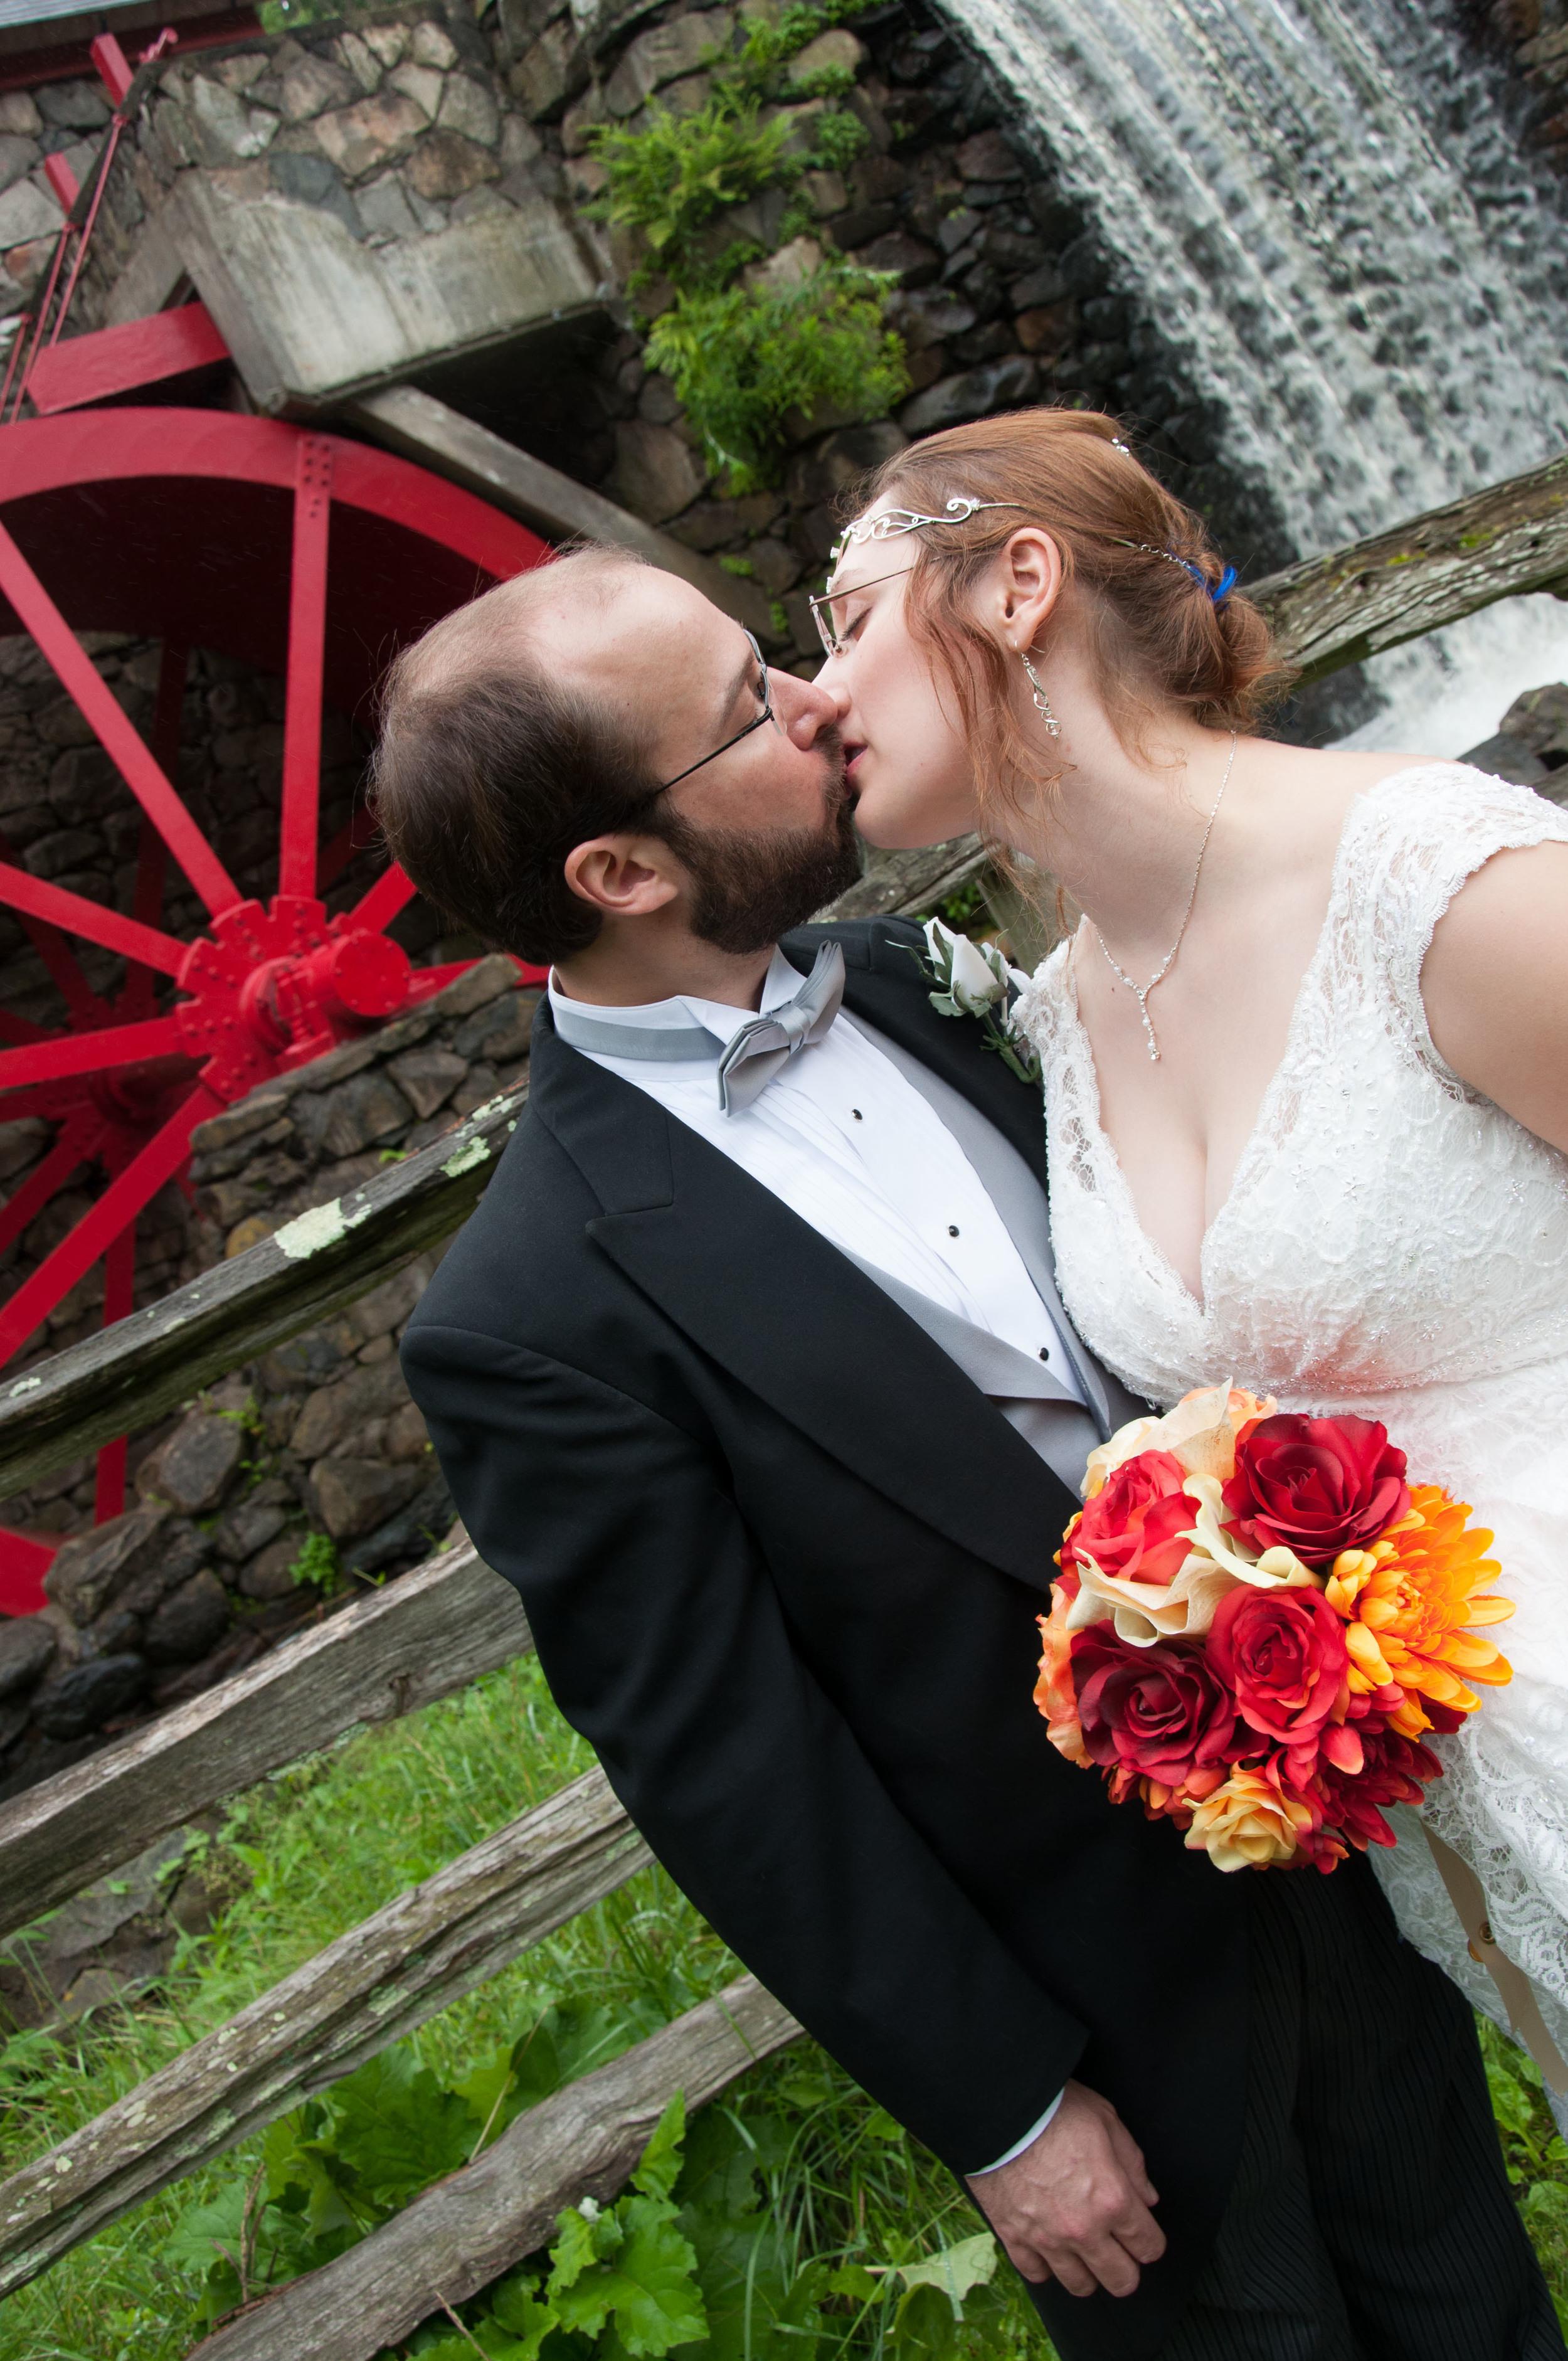 Wedding - Matt and Amber 1019-2.jpg